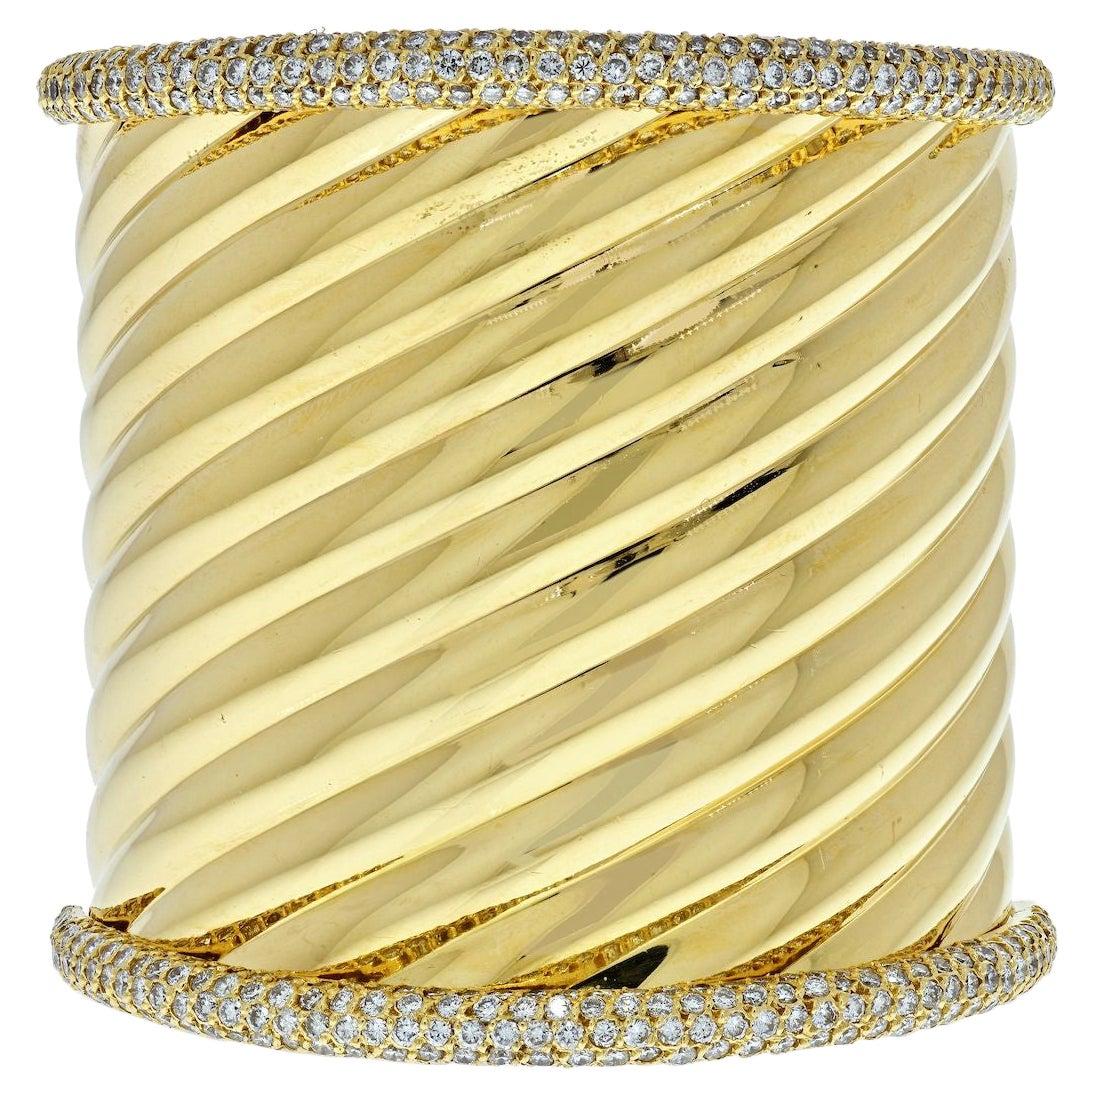 18K Yellow Gold Impressive Significant Rigid Gold Diamond Cuff Bangle Bracelet